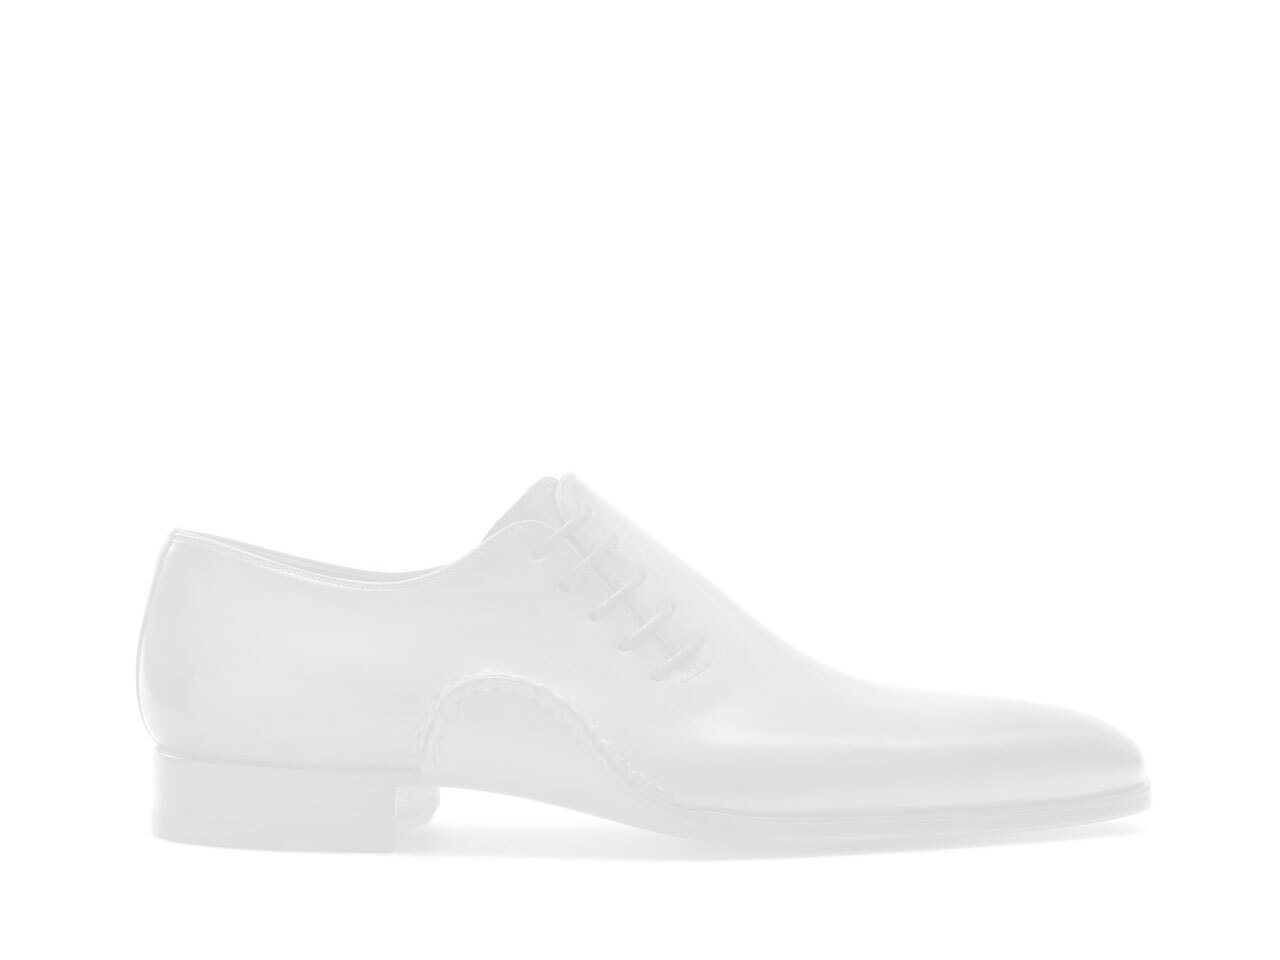 Sole of the Magnanni Playa Perf Cognac Men's Sandal Slides